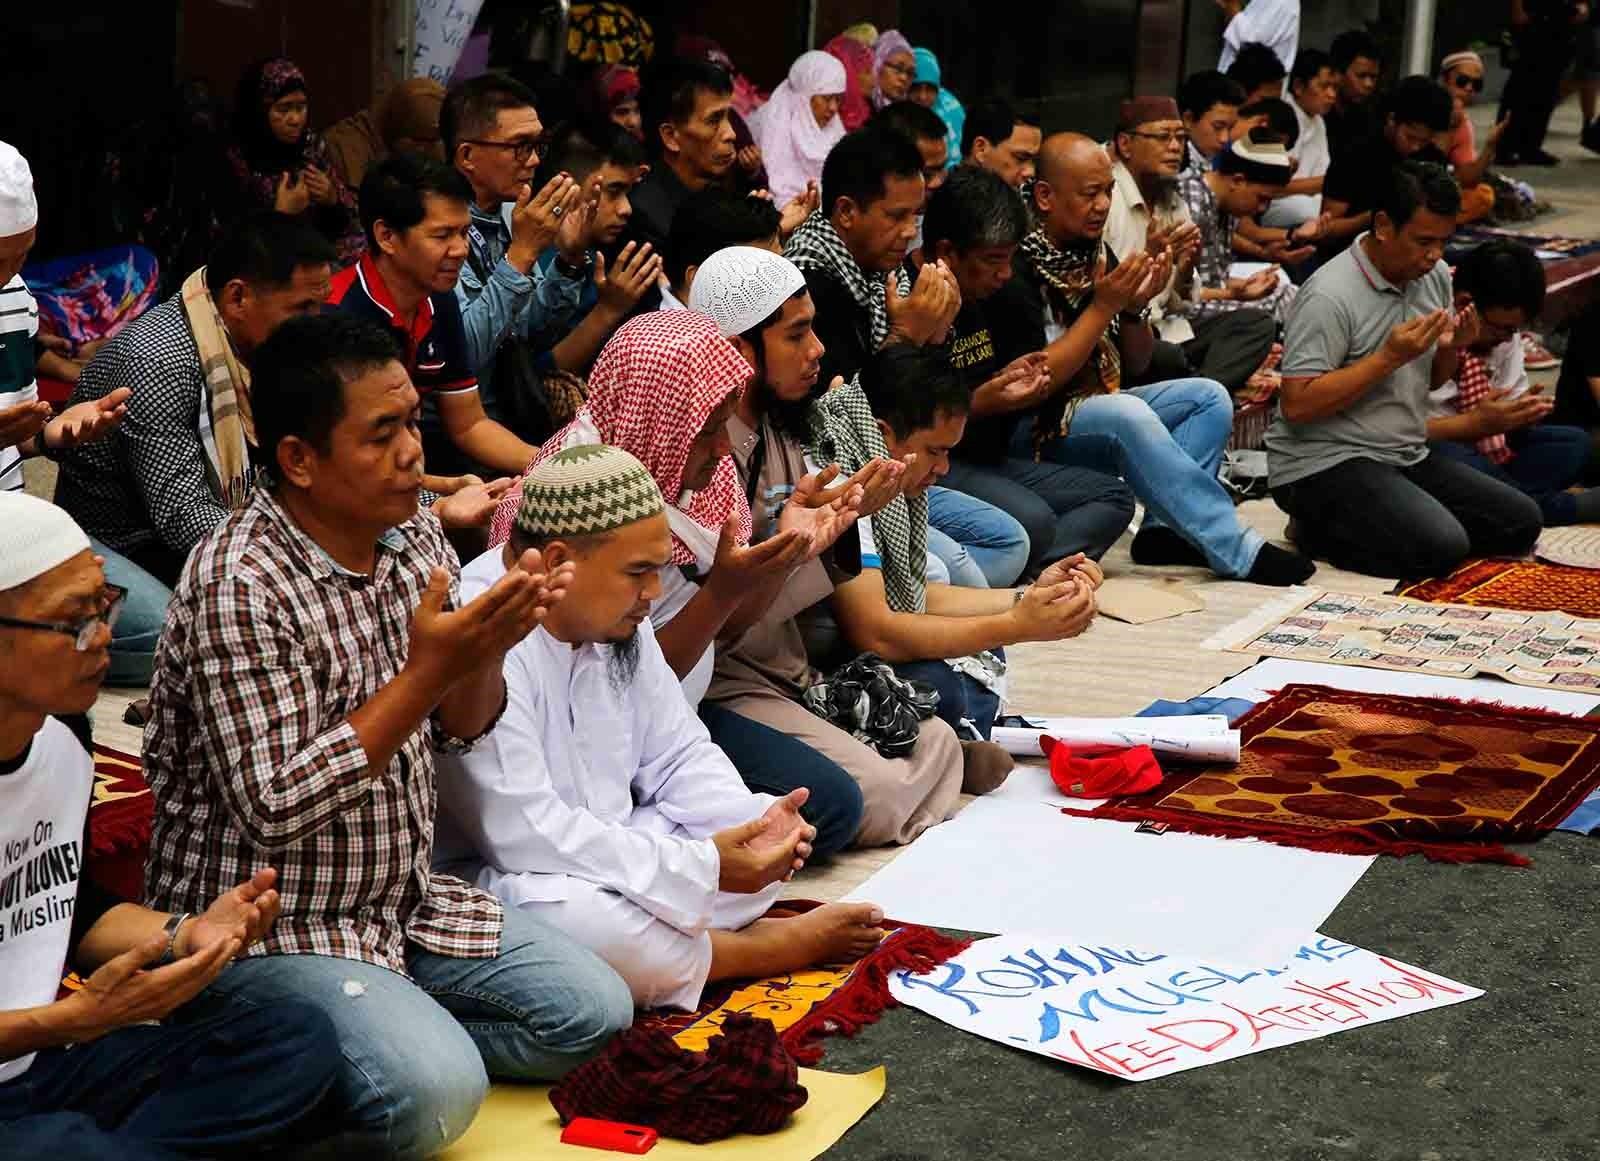 makati muslim Get prayer times in manila calculate islamic namaz timing in manila, philippines for fajr, dhuhr, asr, maghrib and isha - muslim world league (mwl.